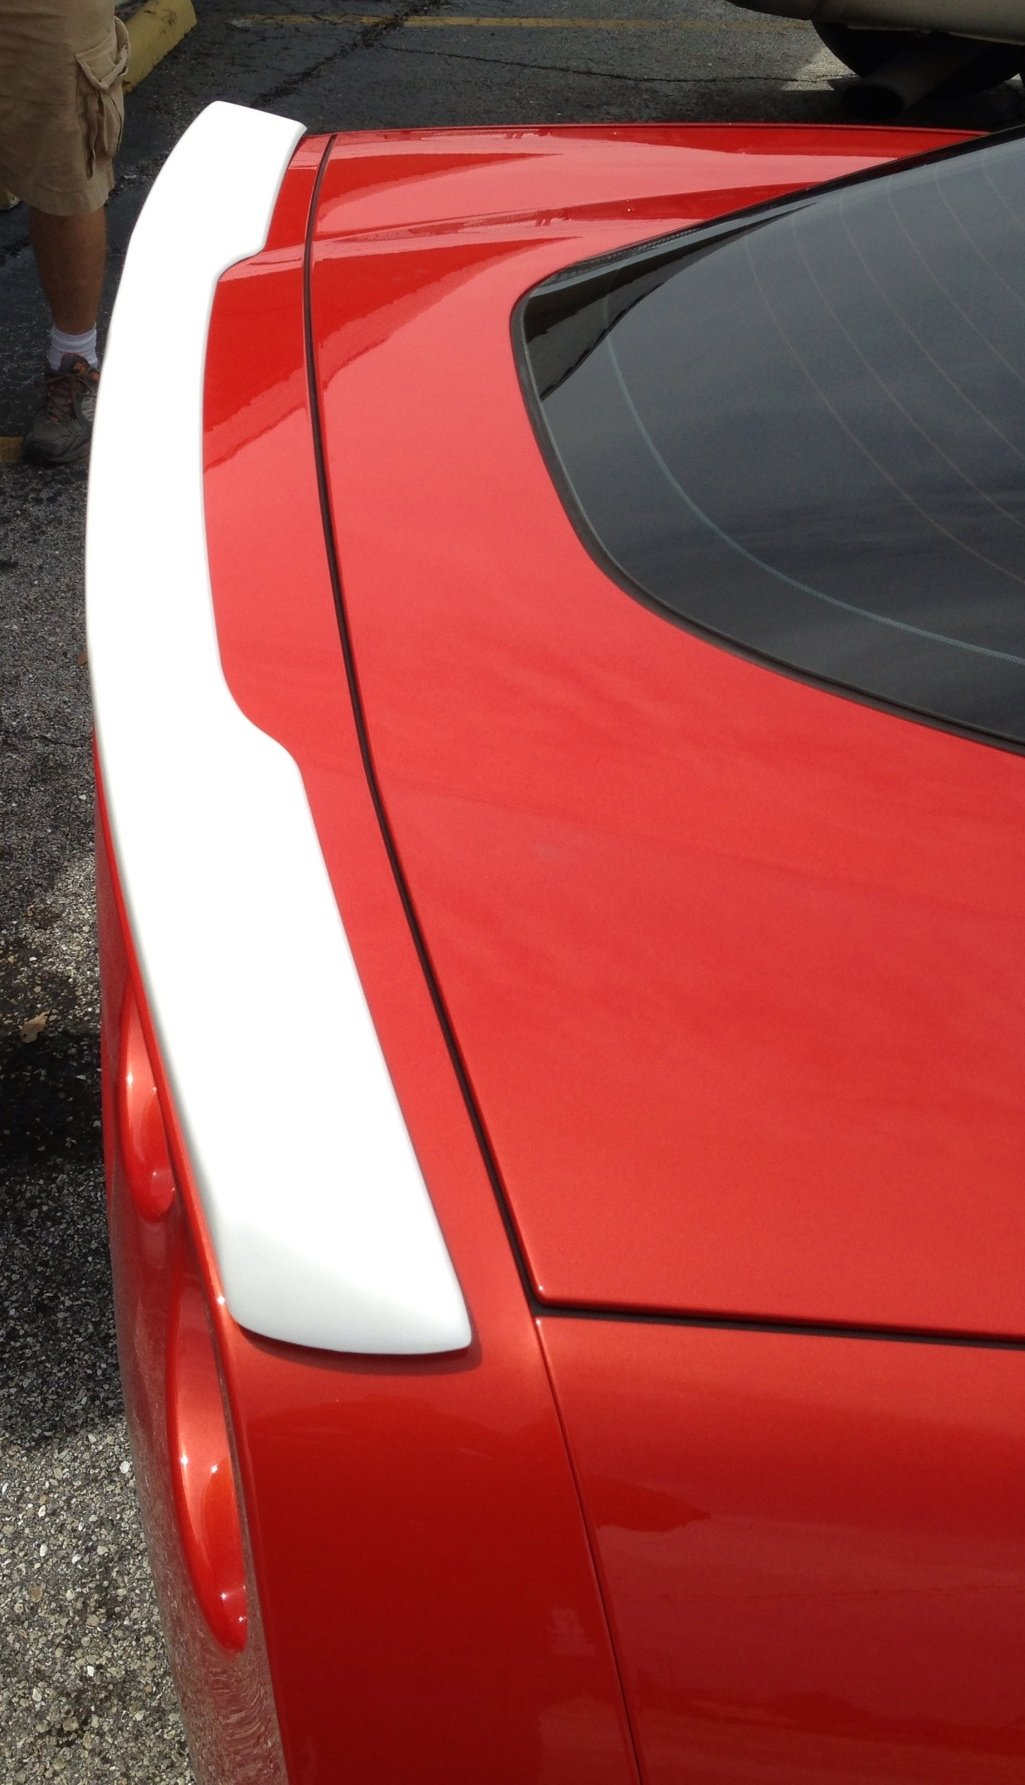 Performance Corvettes 2005-2013 Corvette C6 ZR1 Style Spoiler No Drilling ABS Plastic